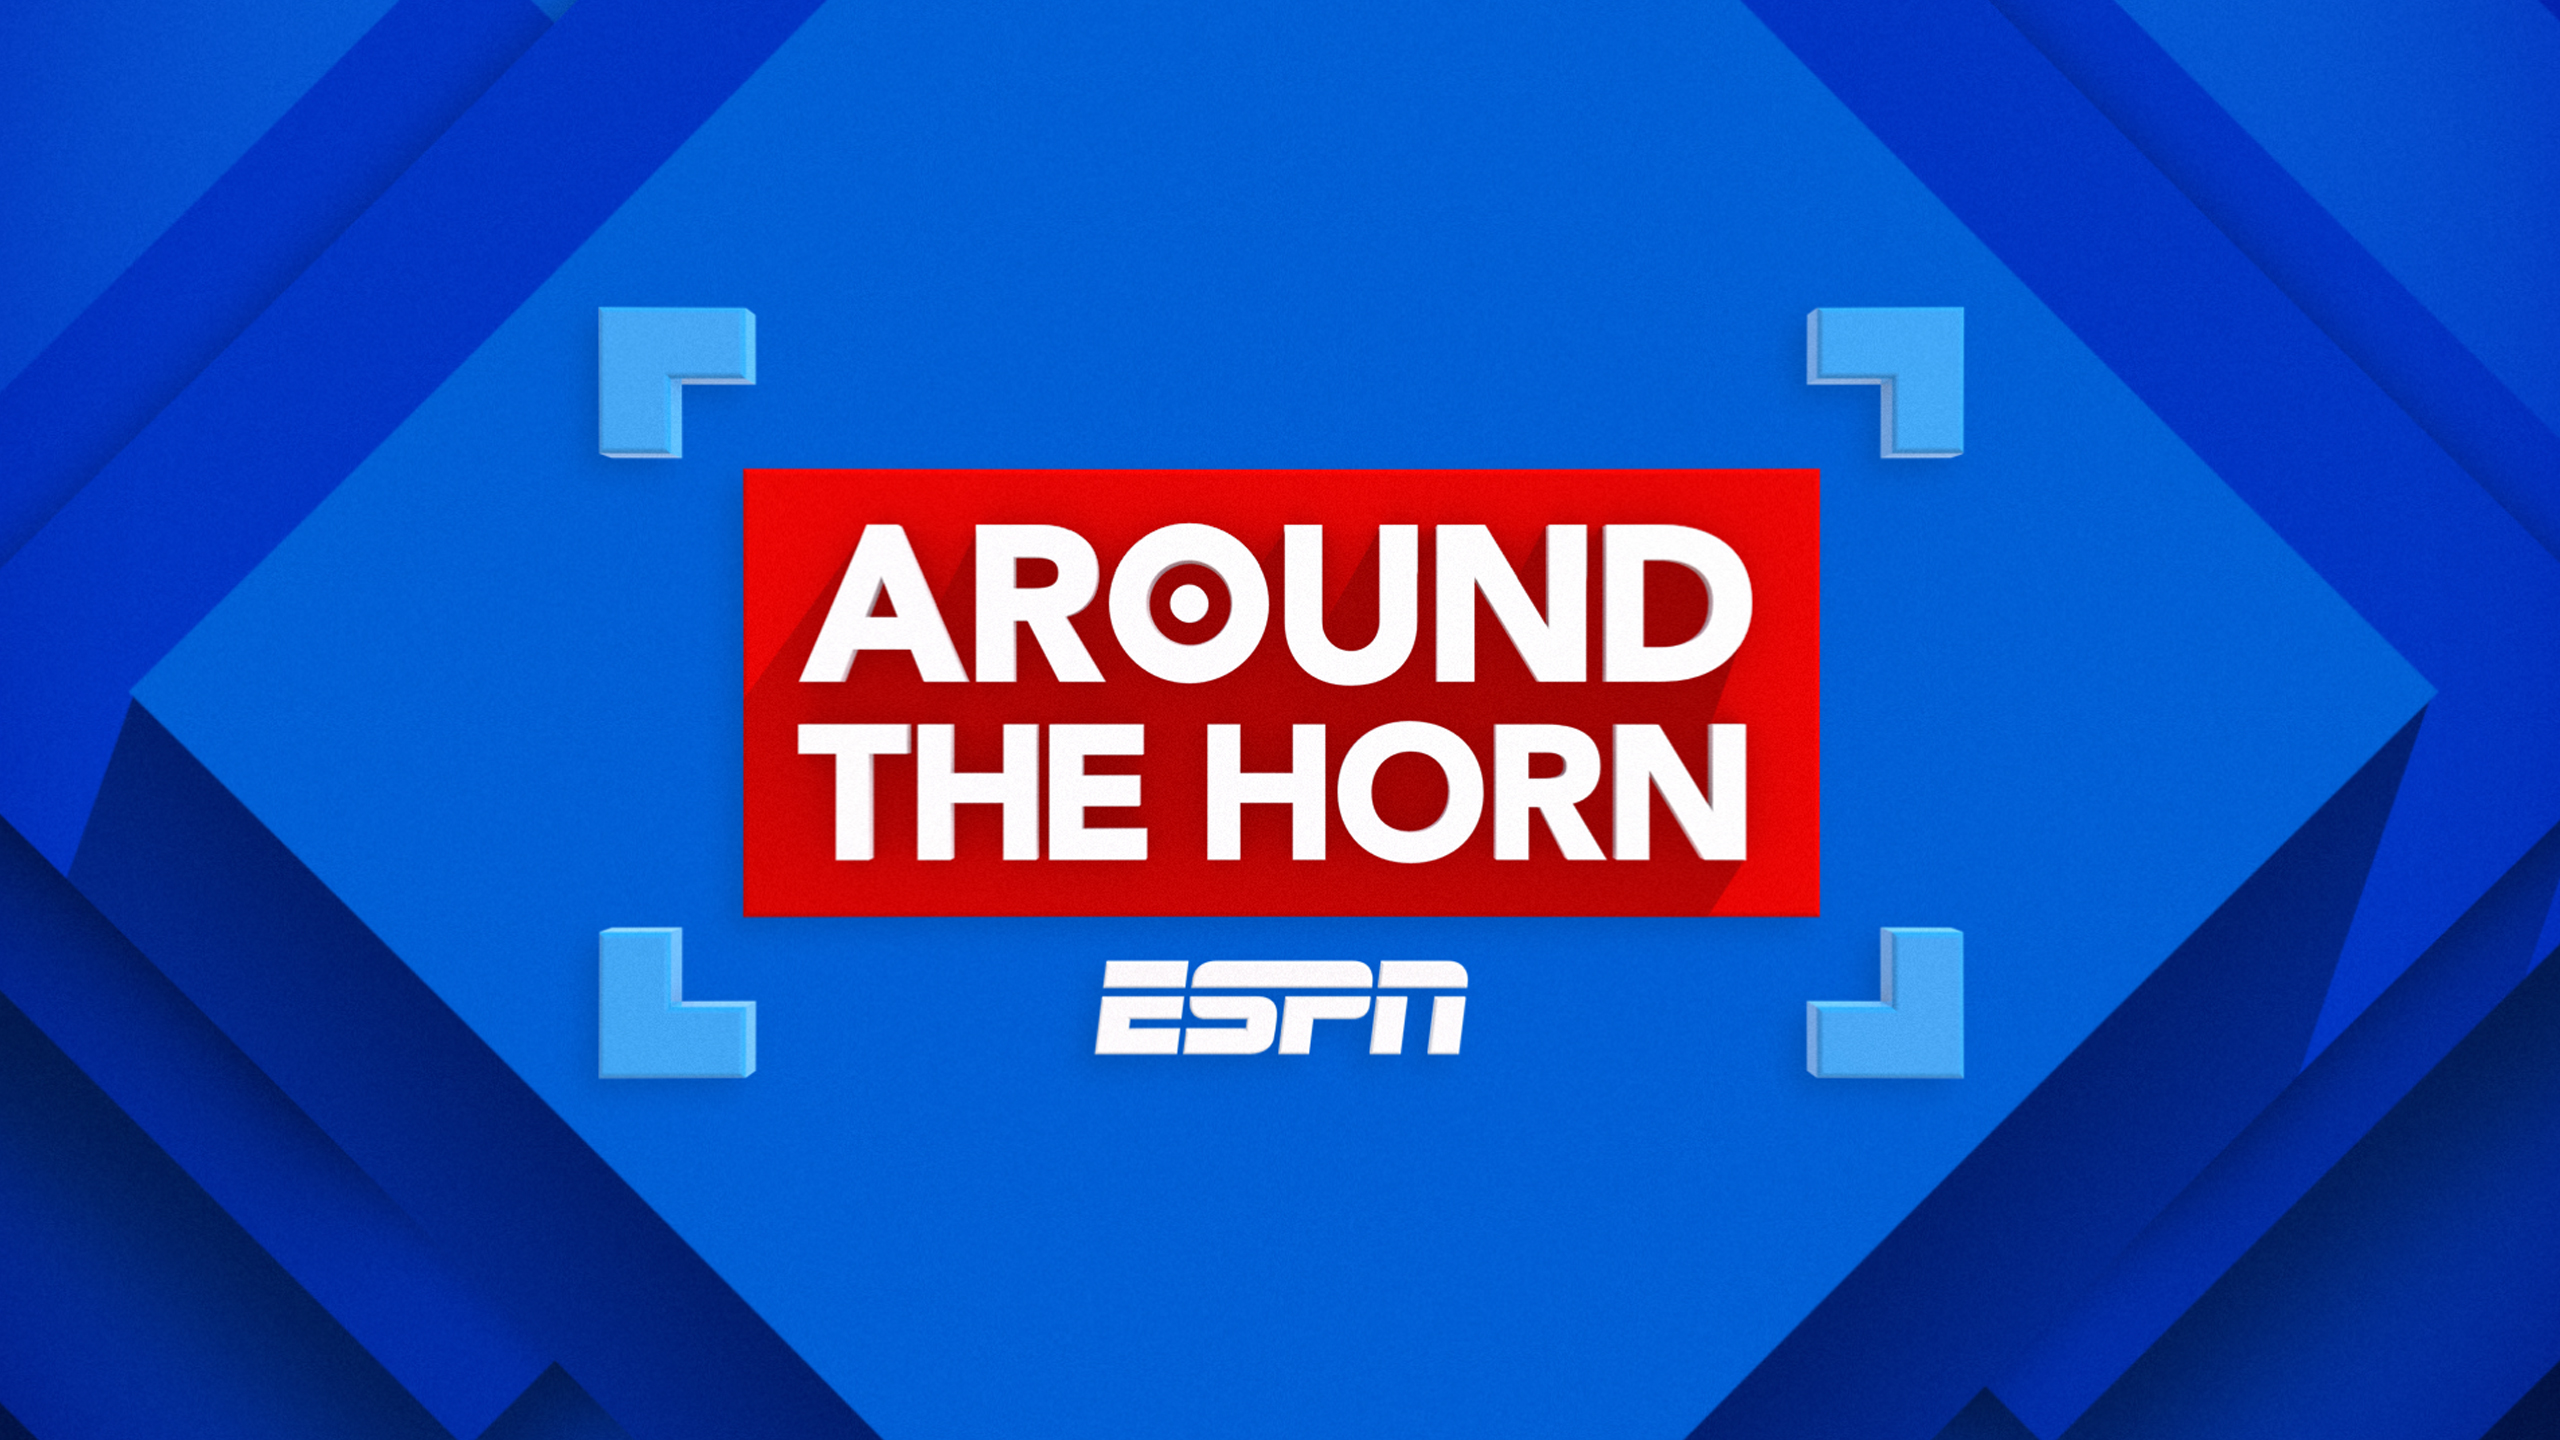 Fri, 12/7 - Around The Horn